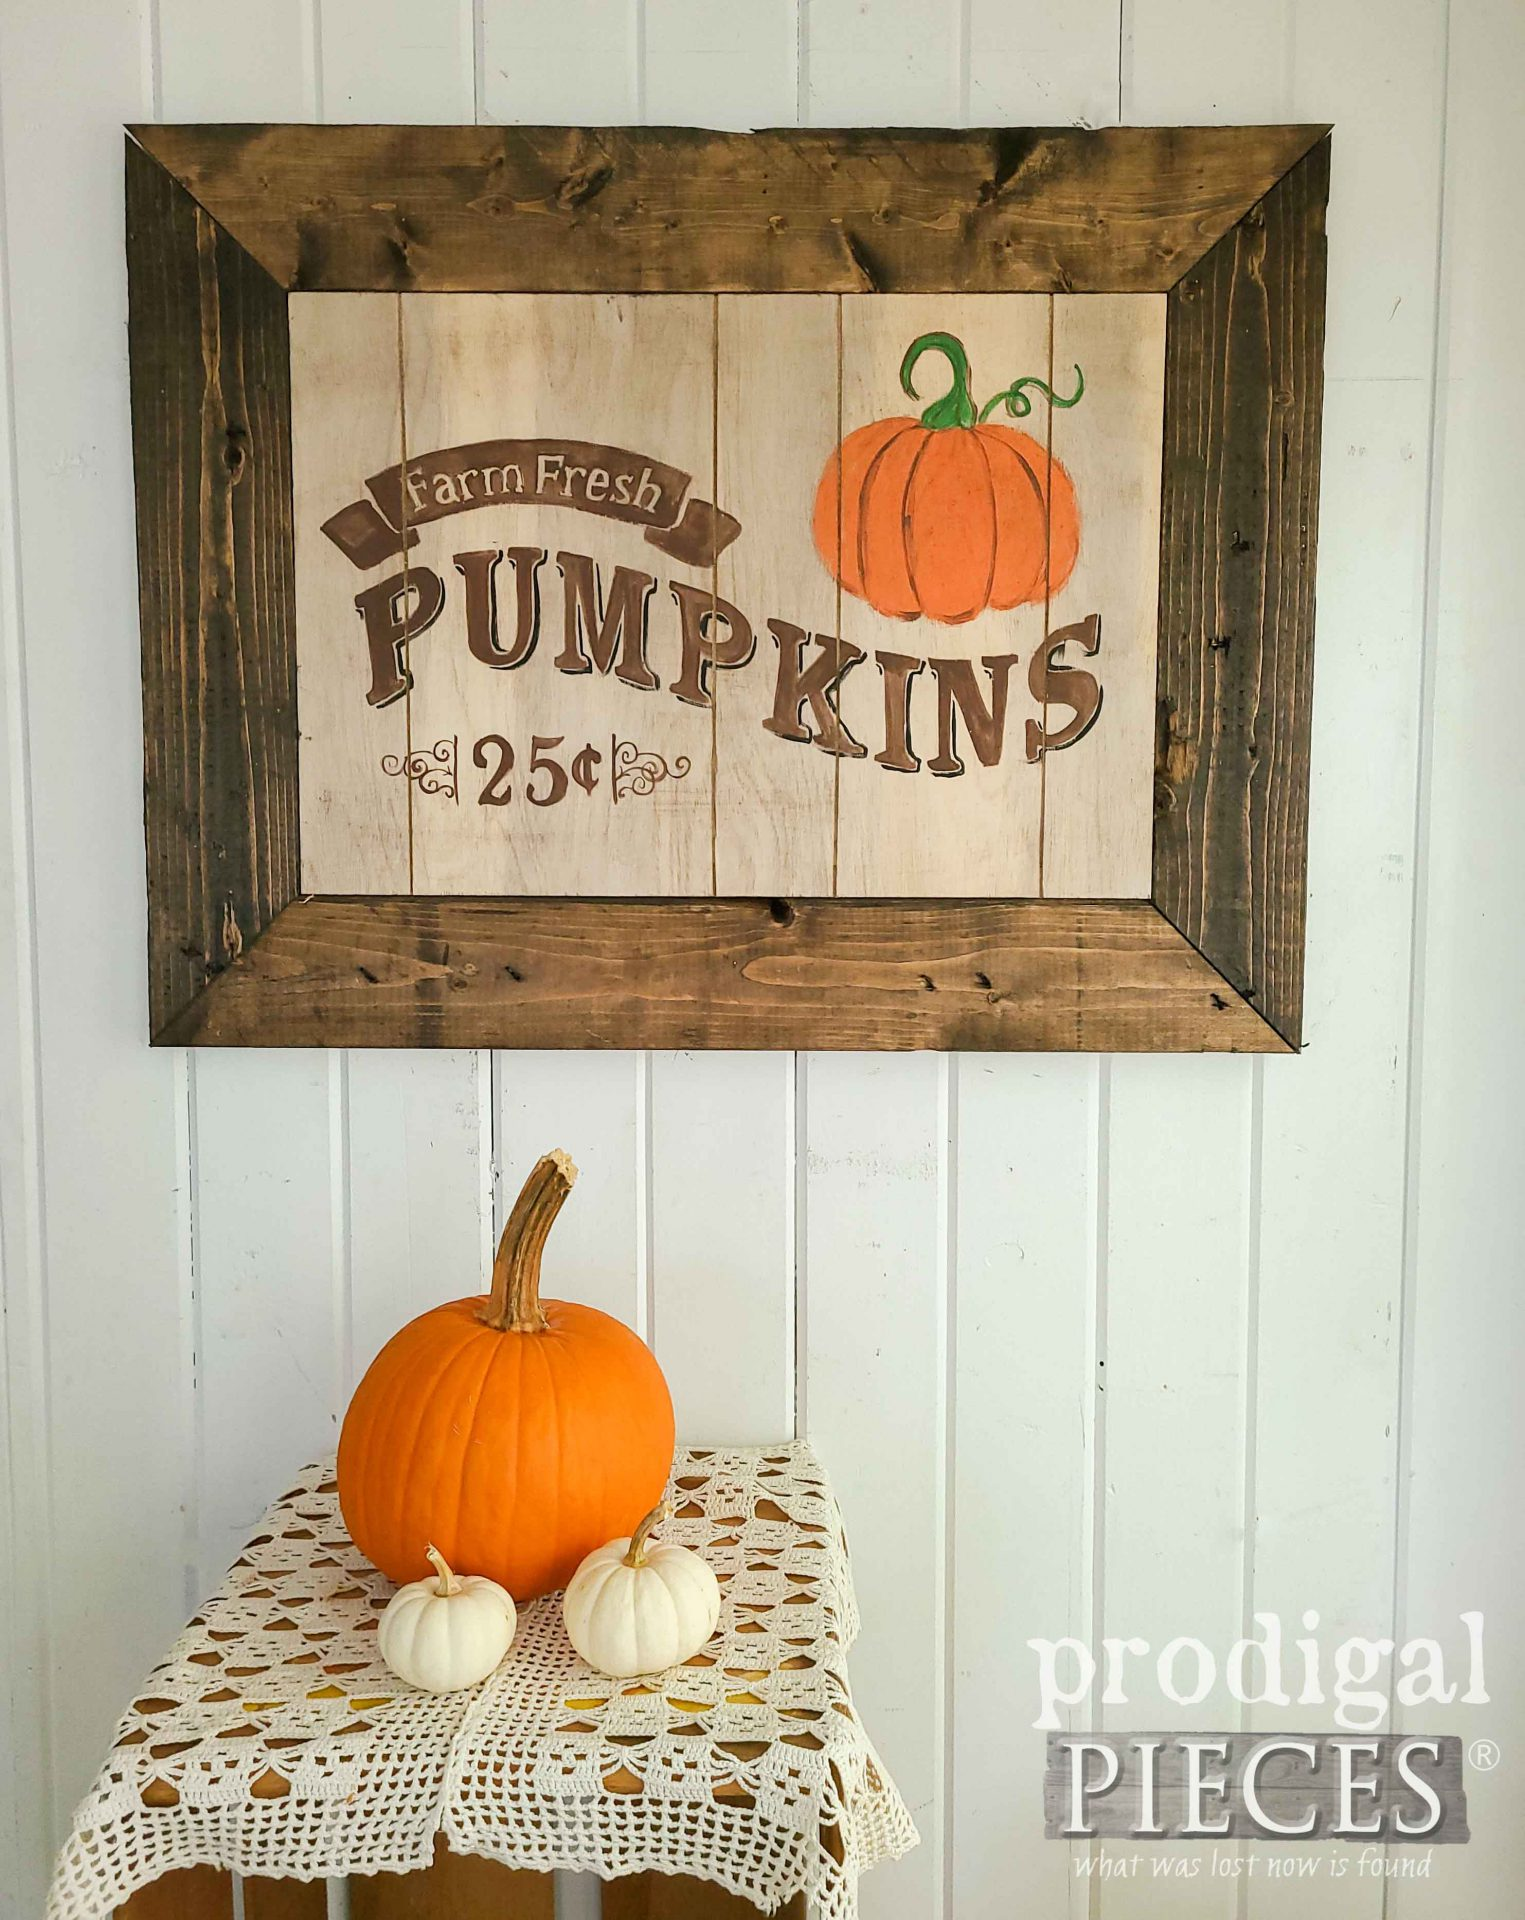 Farmhouse Pumpkin Harvest Sign by Larissa of Prodigal Pieces | prodigalpieces.com #prodigalpieces #farmhouse #diy #home #homedecor #fall